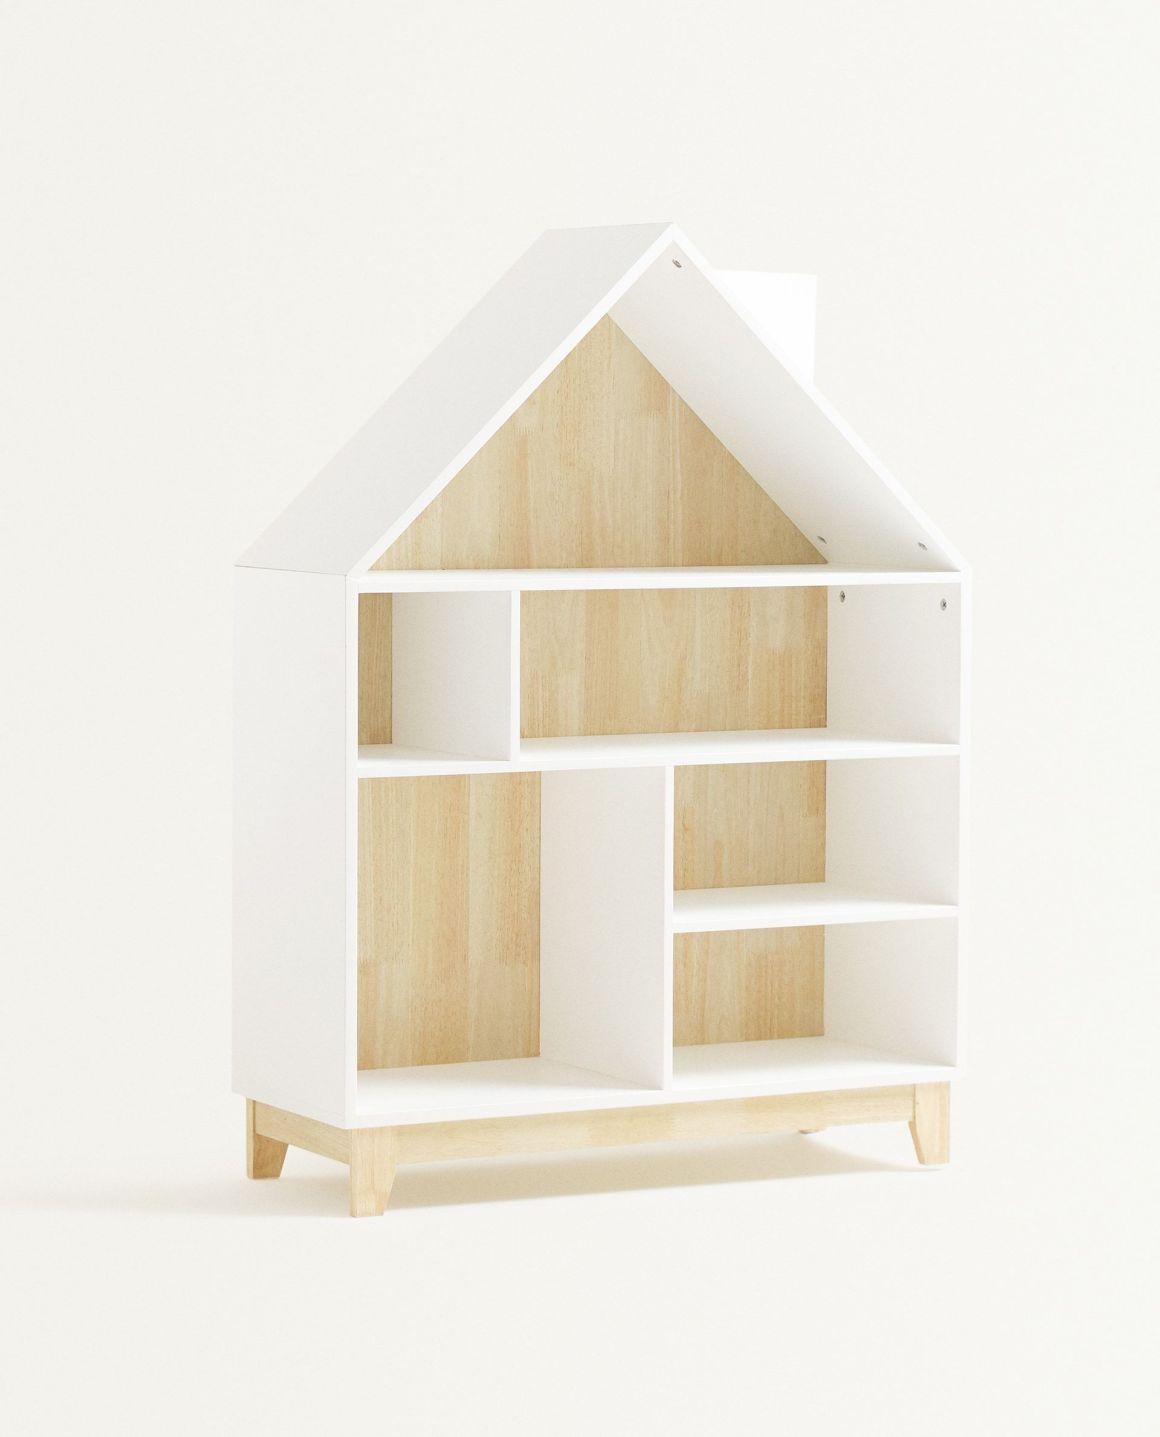 Estantería con forma de casa para niños de Zara Home